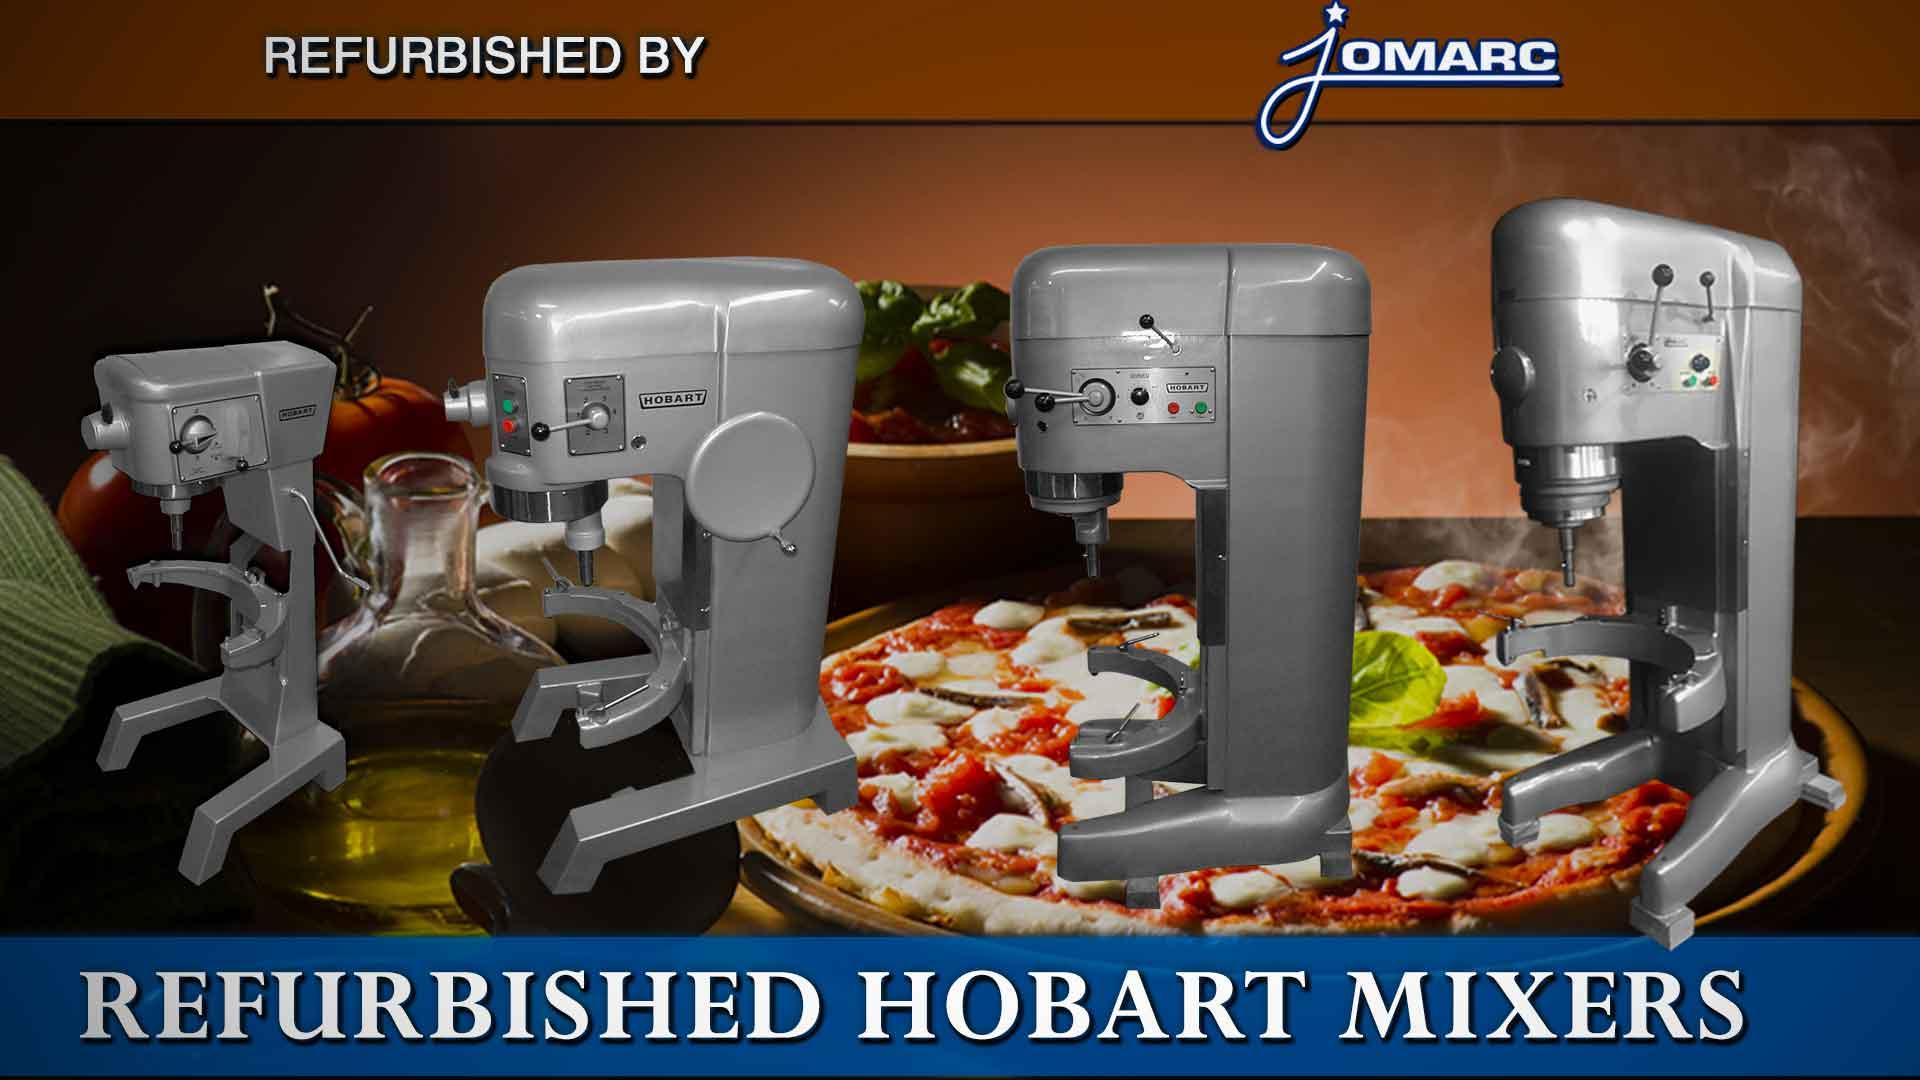 hight resolution of buy a refurbished hobart mixer jomarc